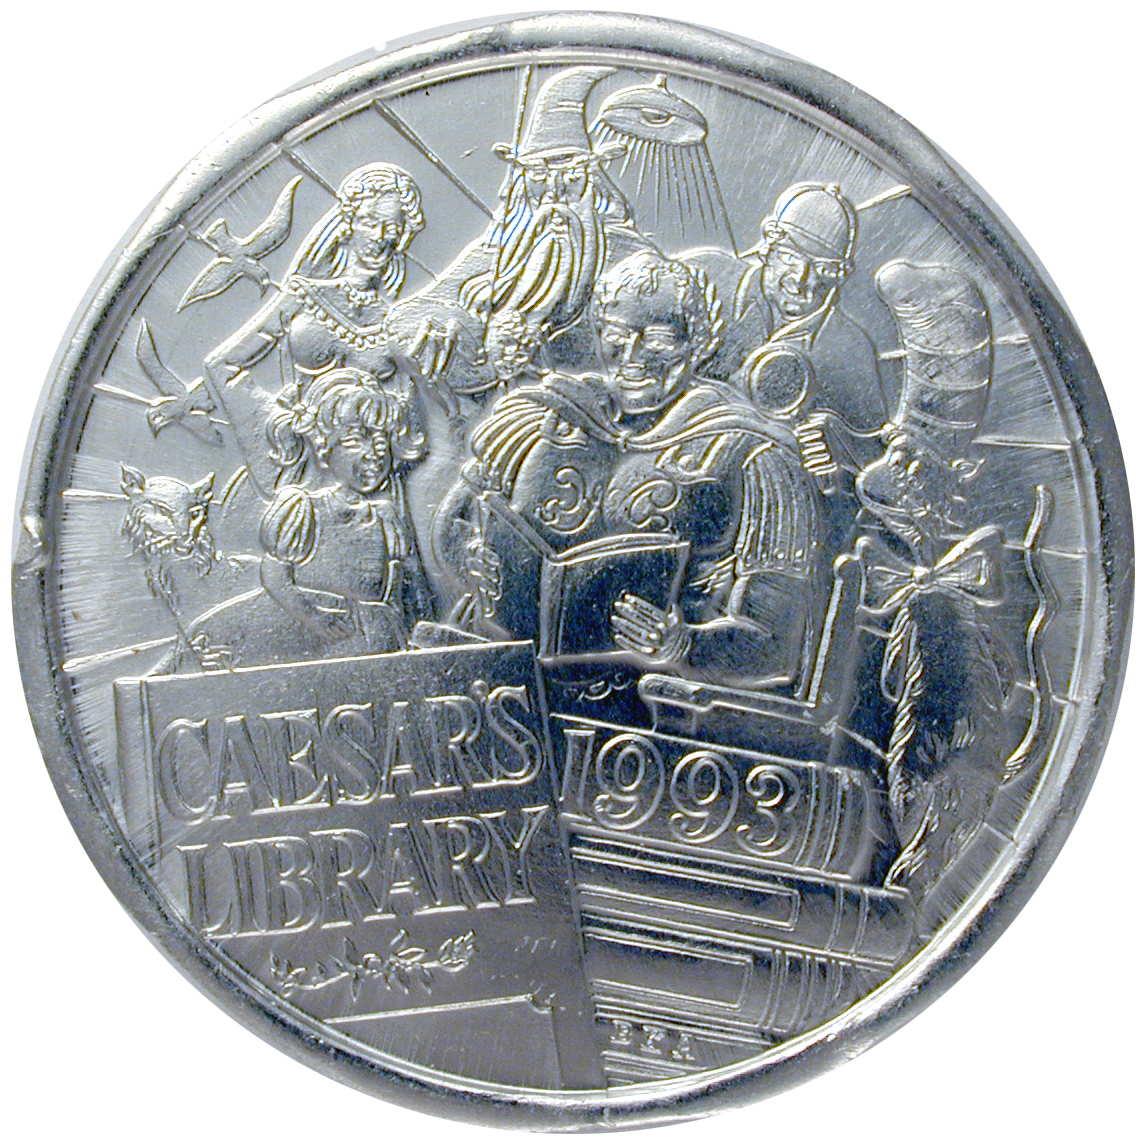 1993 Mardi Gras Doubloons of The Krewe of Caesar